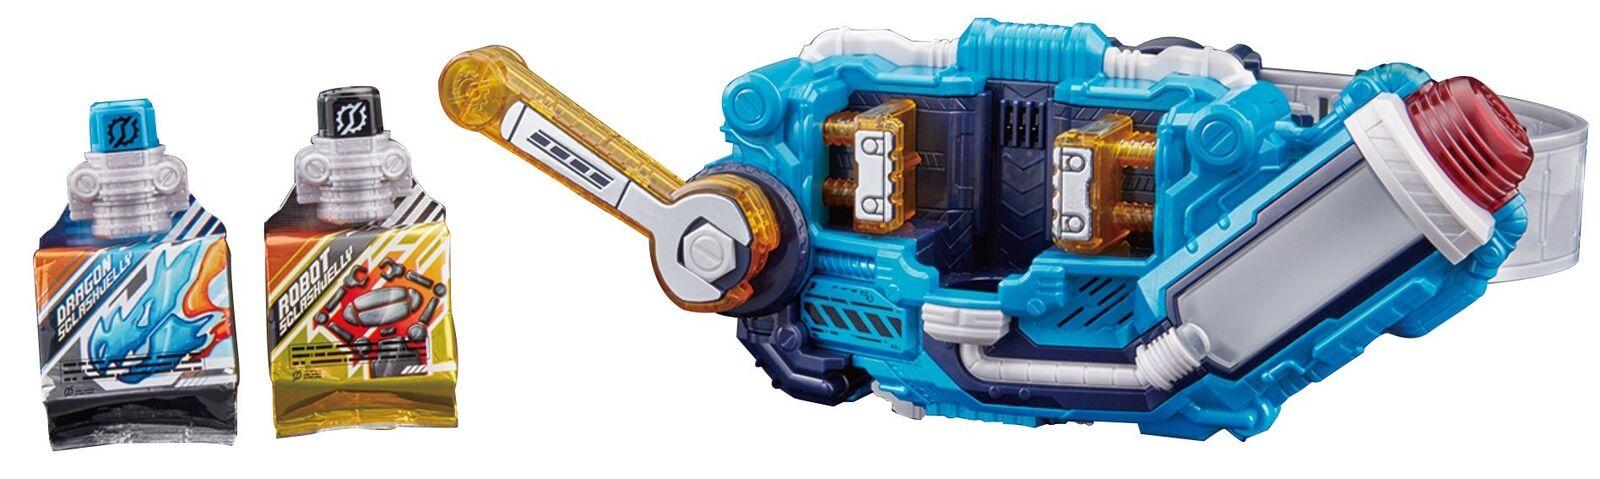 Bandai 208013 Kamen Rider Build Transformation Belt DX Sclash Driver